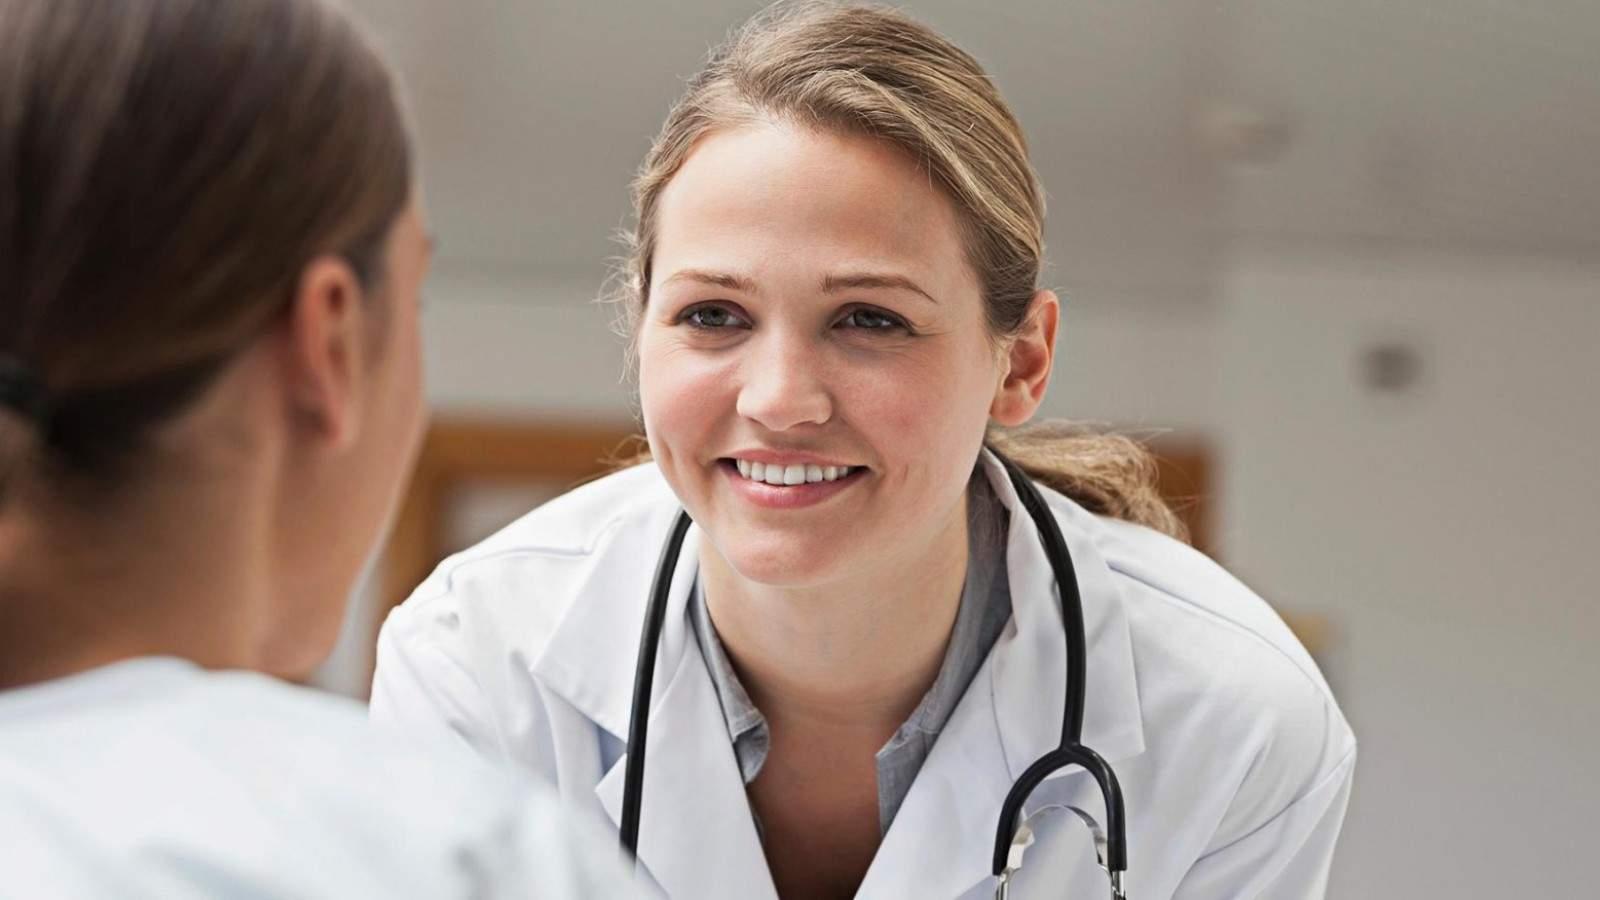 Ayurvedic Energy Booster Remedies To Increase Stamina In Females